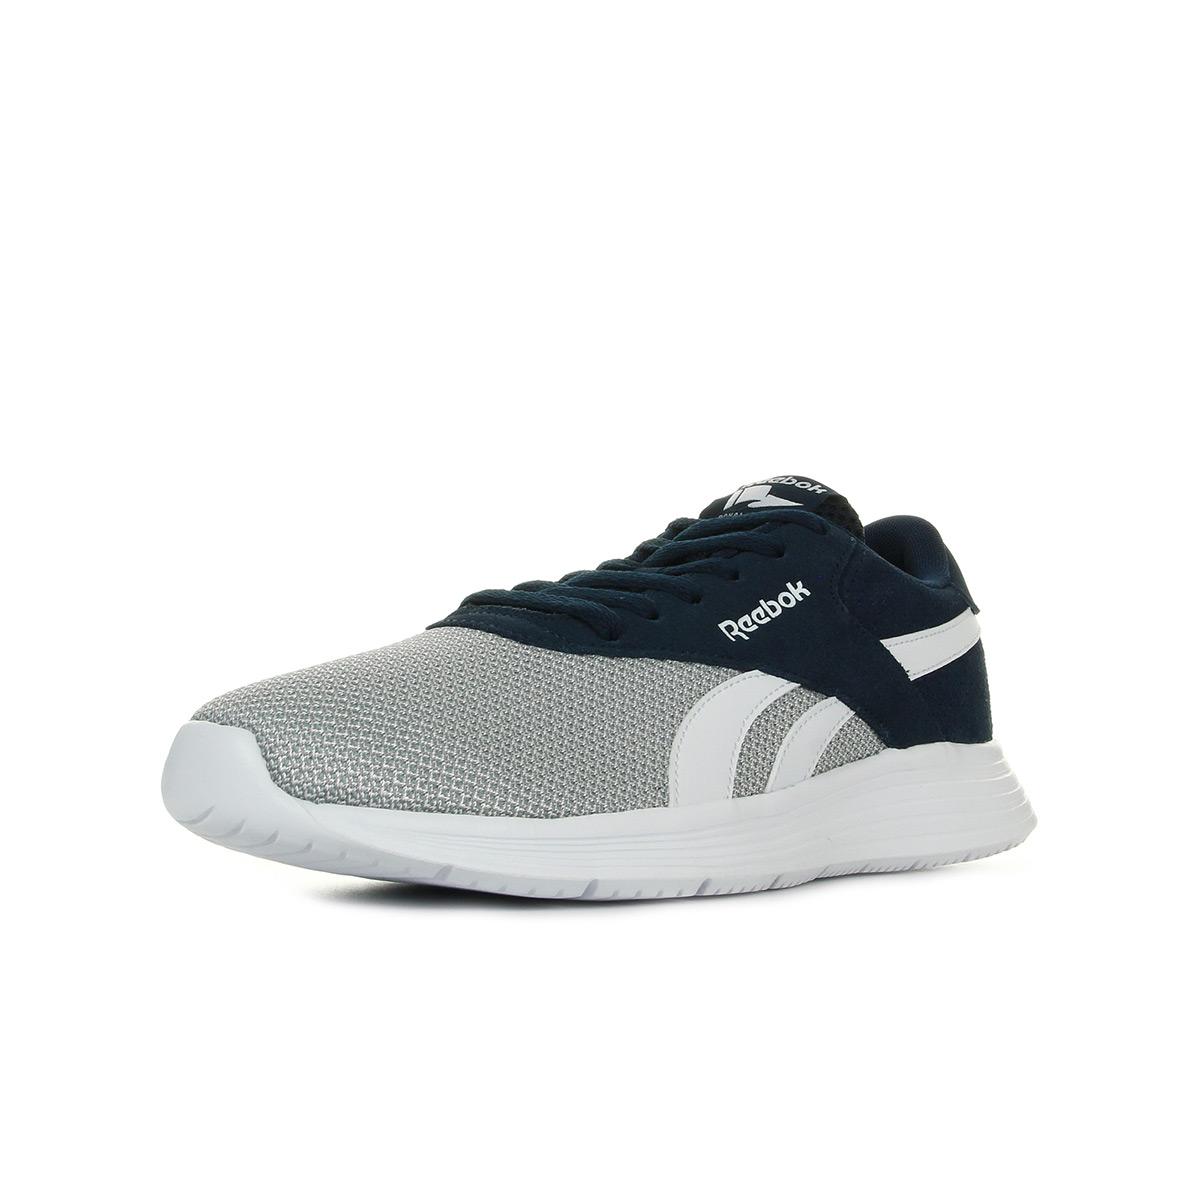 Cl Mccs Basses Homme Gris Chaussures Reebok Sport Leather Baskets 6v5twxxfq